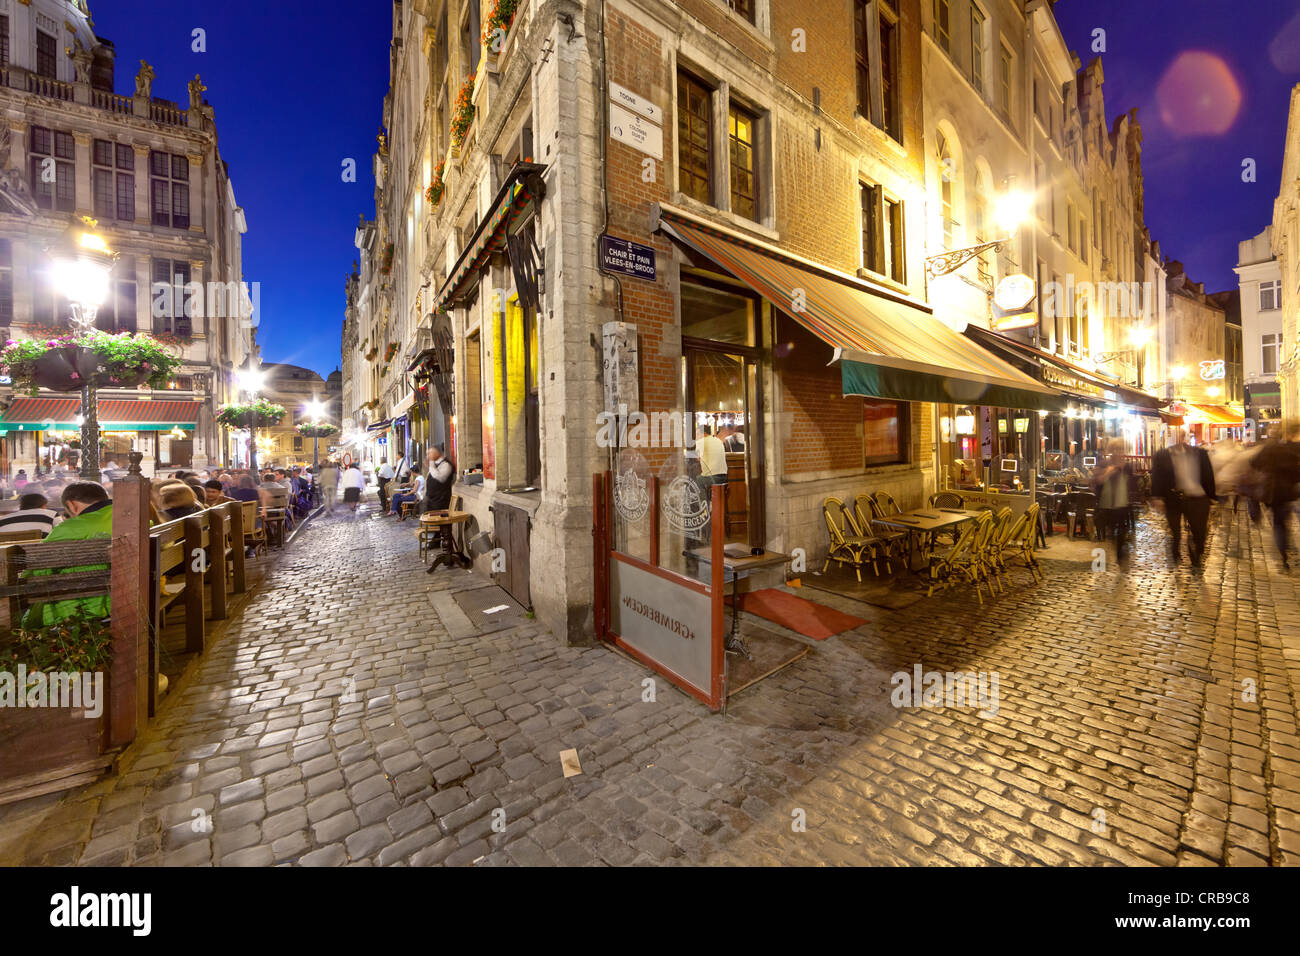 Restaurants in Grote Markt, Grand Place, Brussels, Belgium, Benelux, Europe Stock Photo